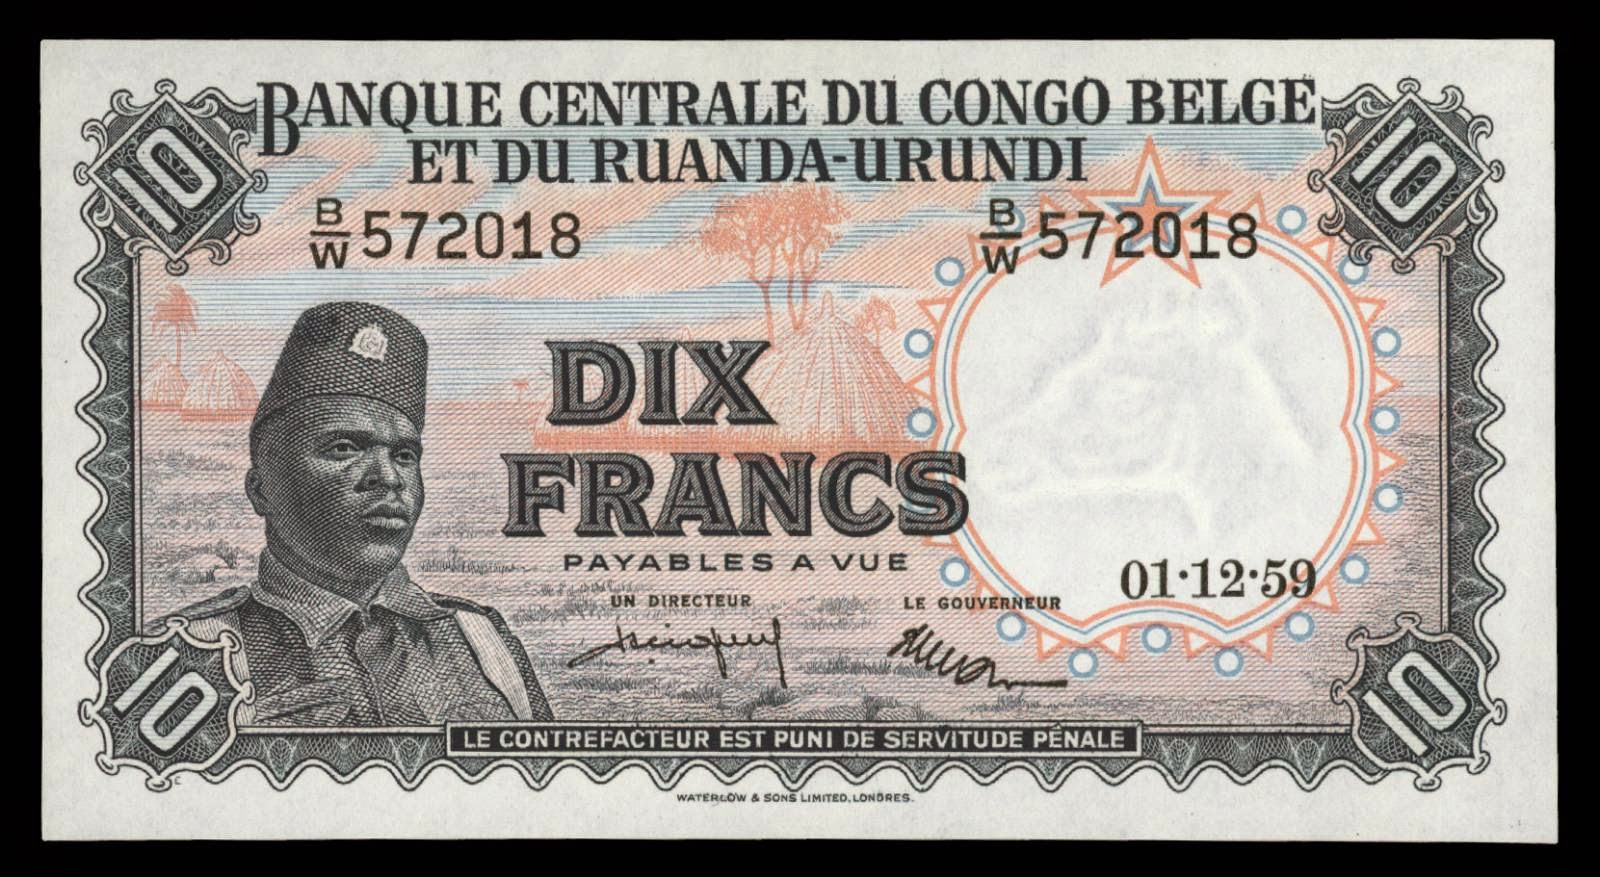 Belgian Congo banknotes 10 Francs soldier